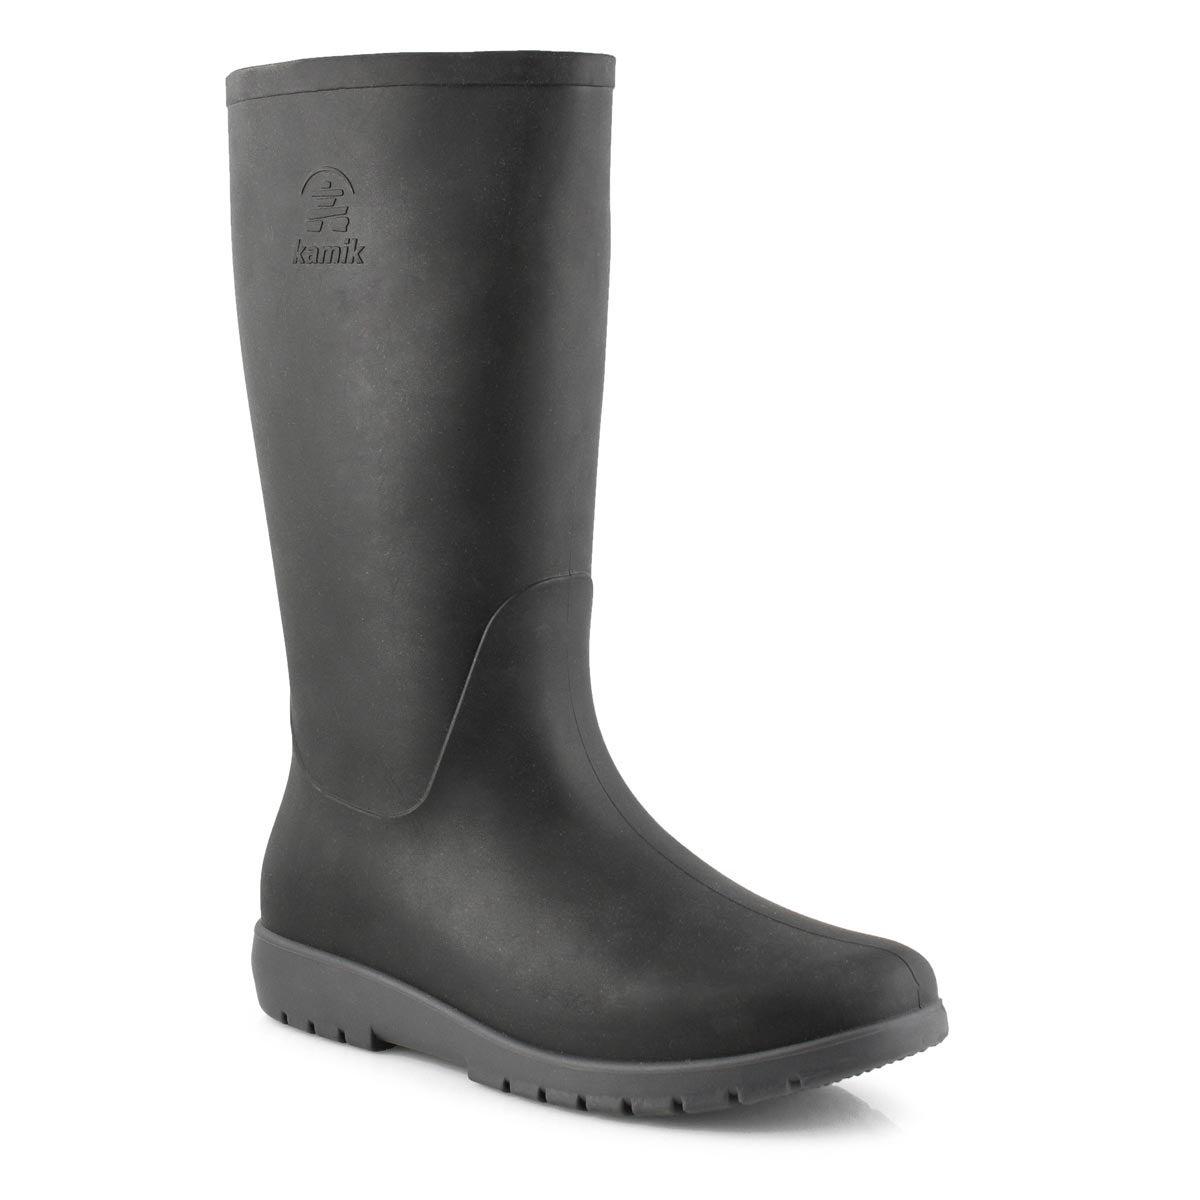 Women's JESSIE blk/char mid waterproof rain boots